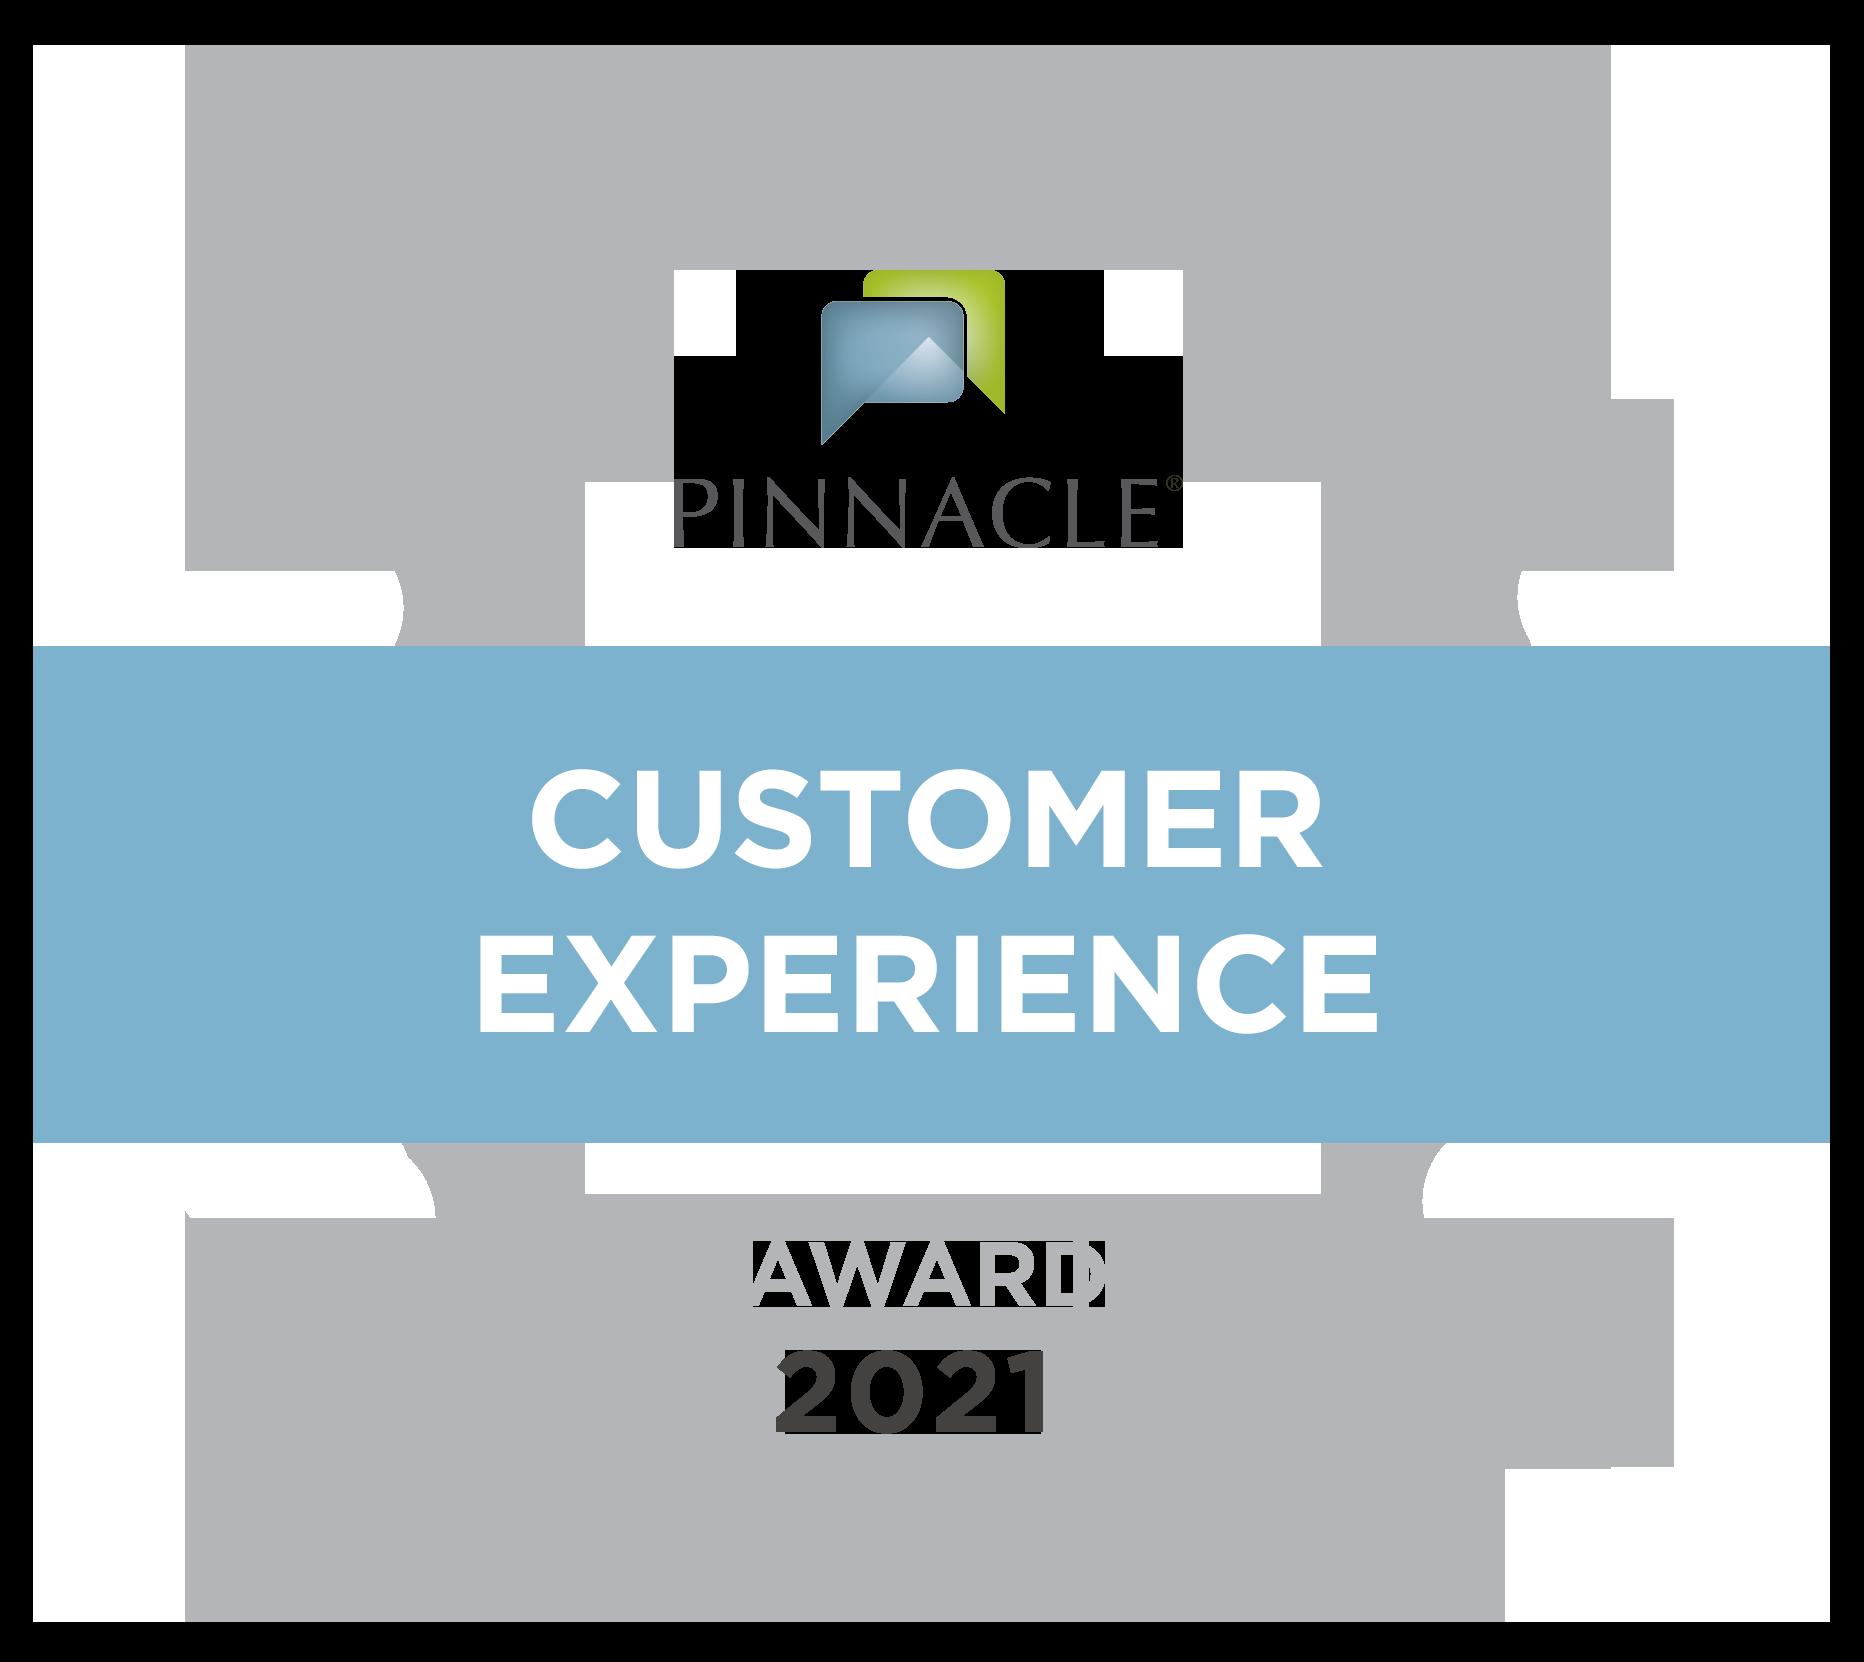 2021 Customer Experience Award